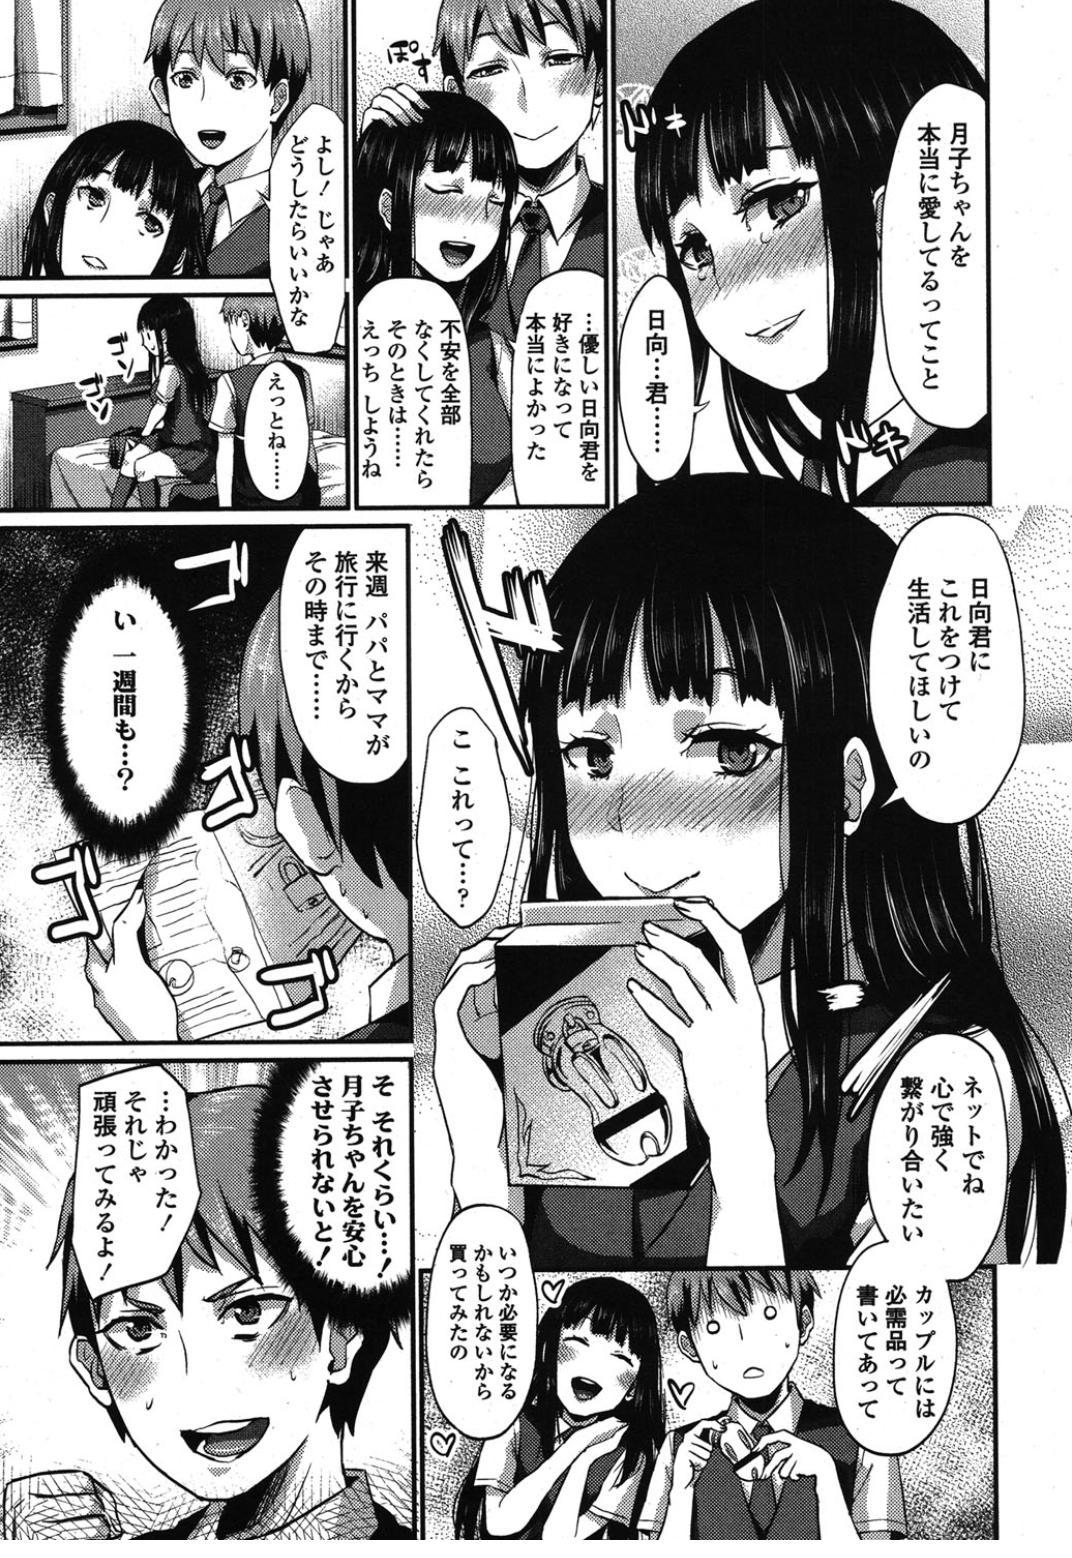 Girls forM Vol. 08 295